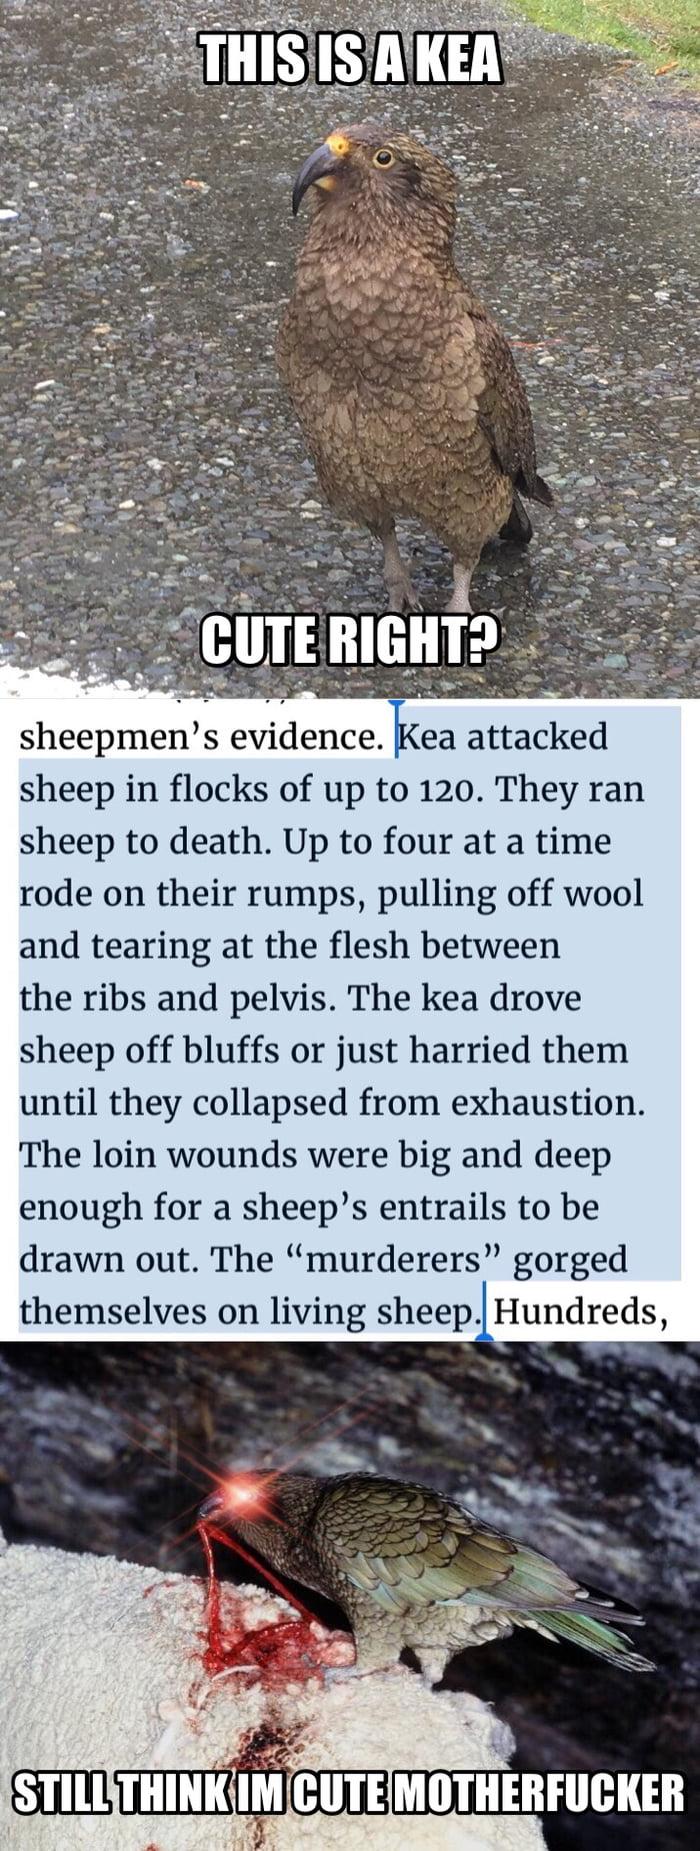 Keas are pretty brutal